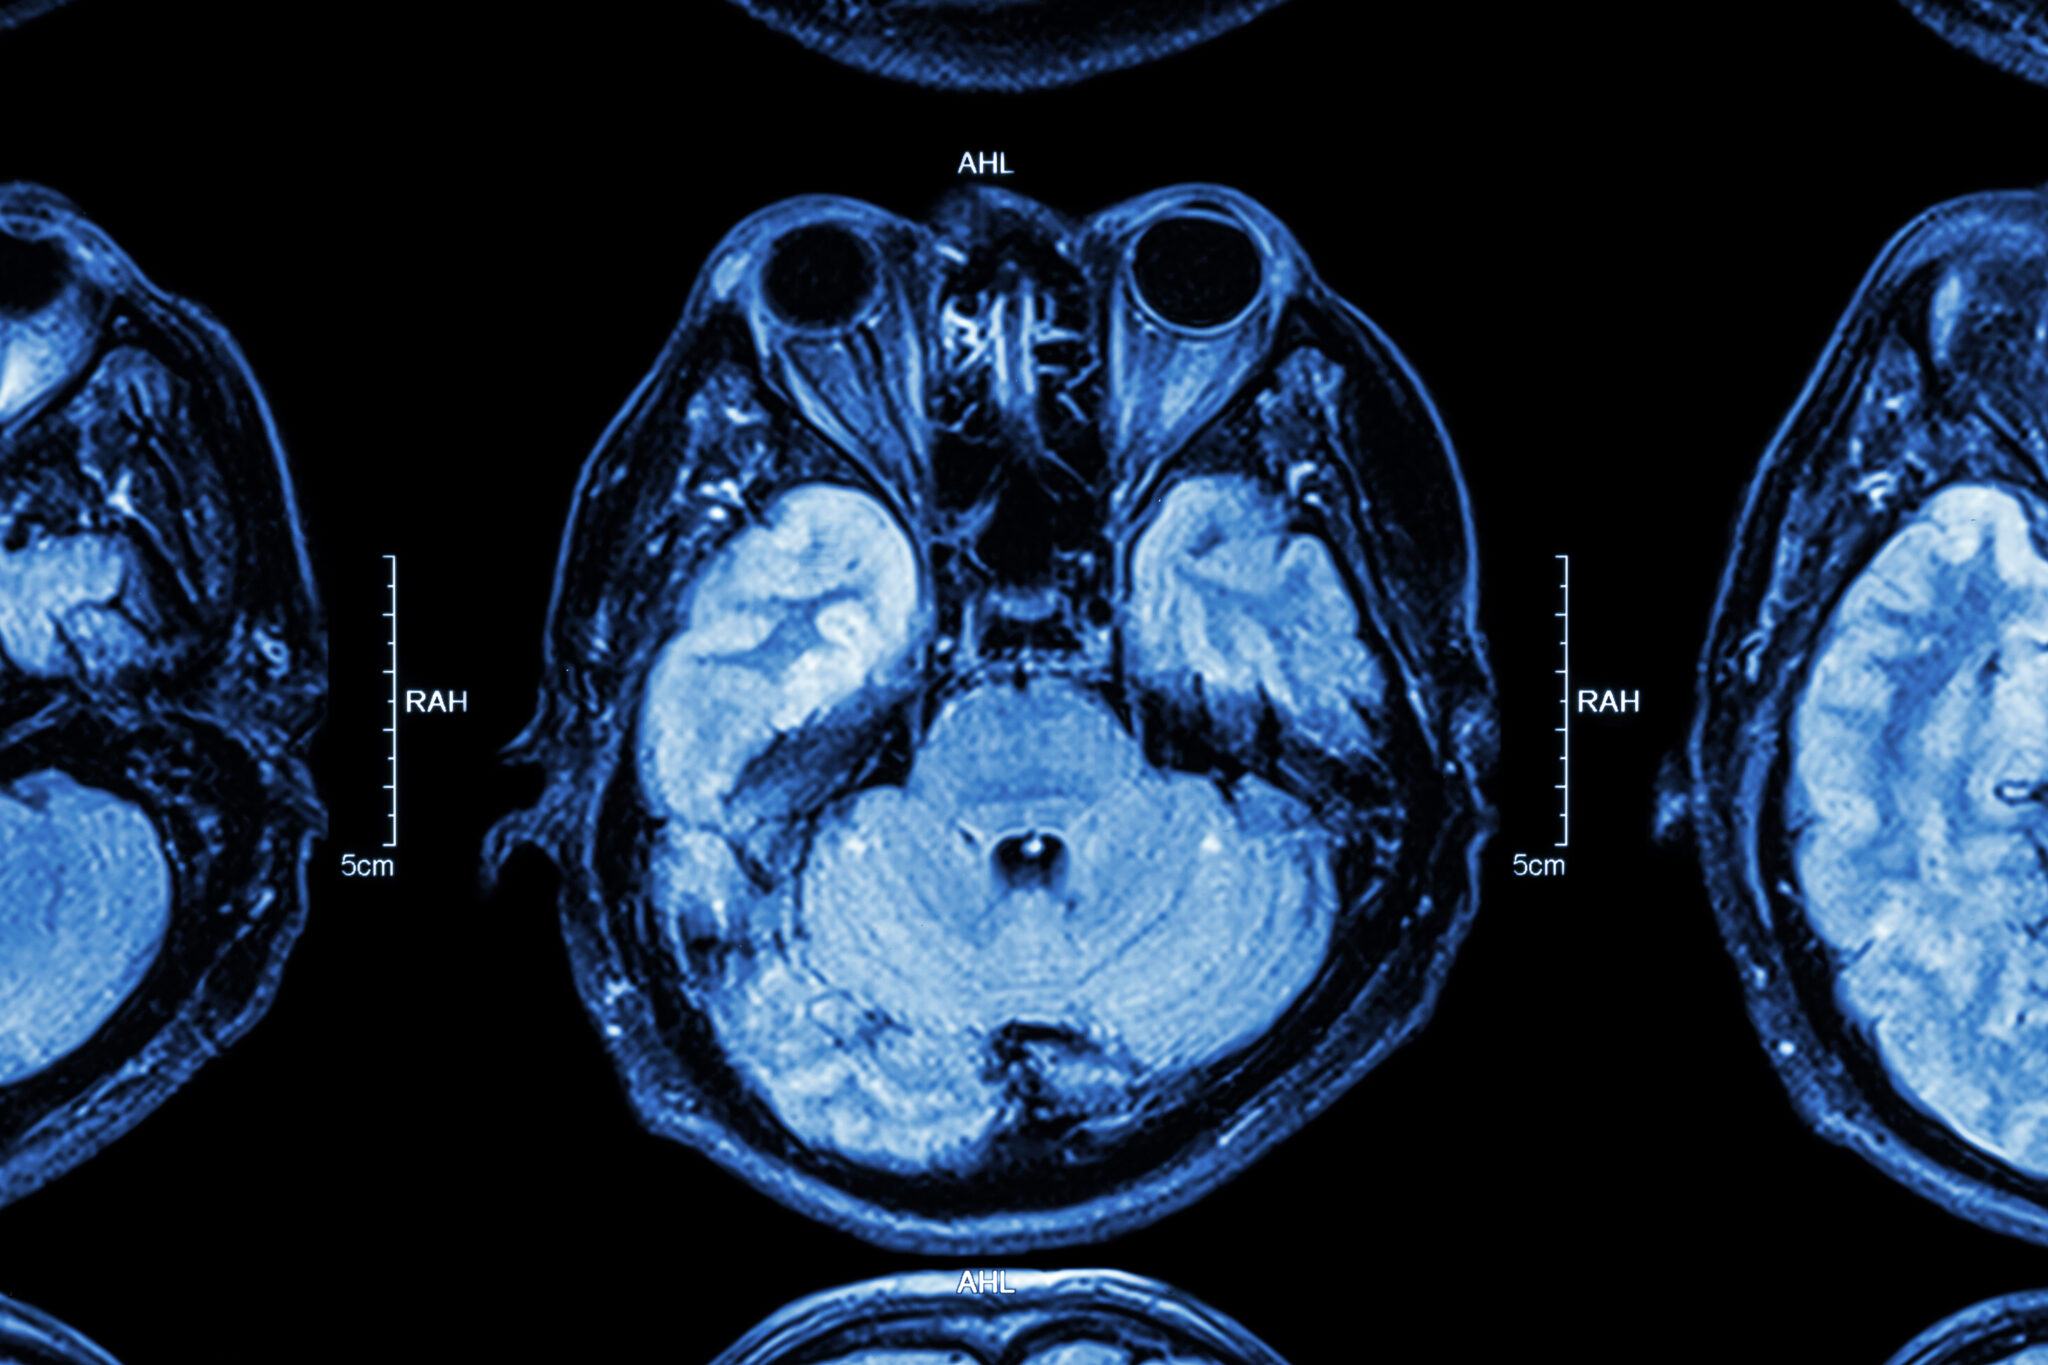 Neurosurgery types of brain surgery